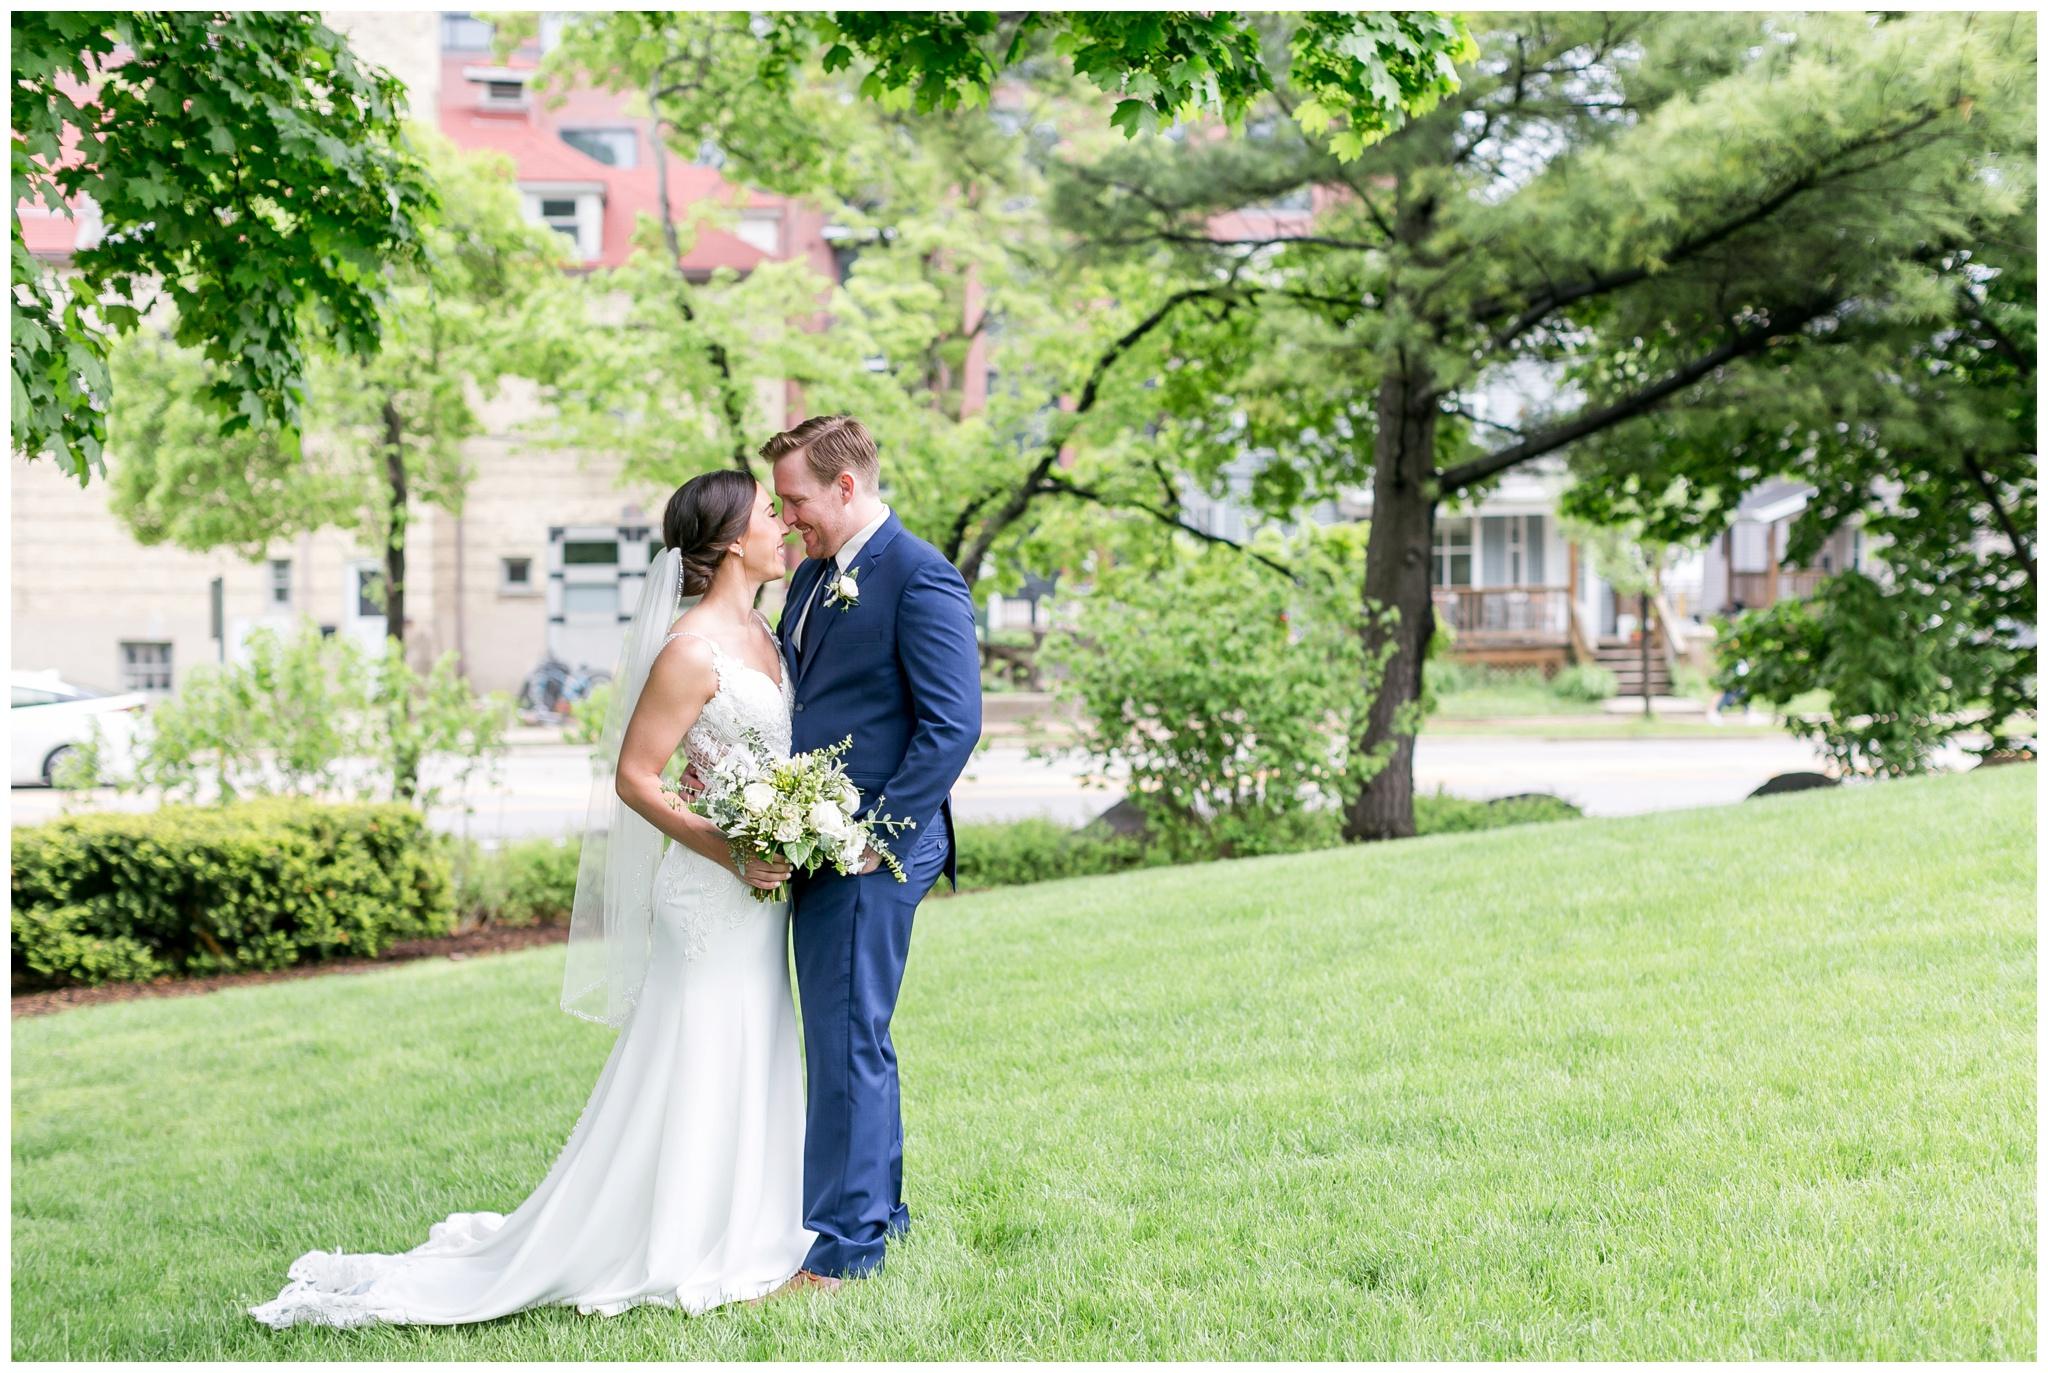 Union_south_Wedding_Madison_Wisconsin_Caynay_Photo_3639.jpg